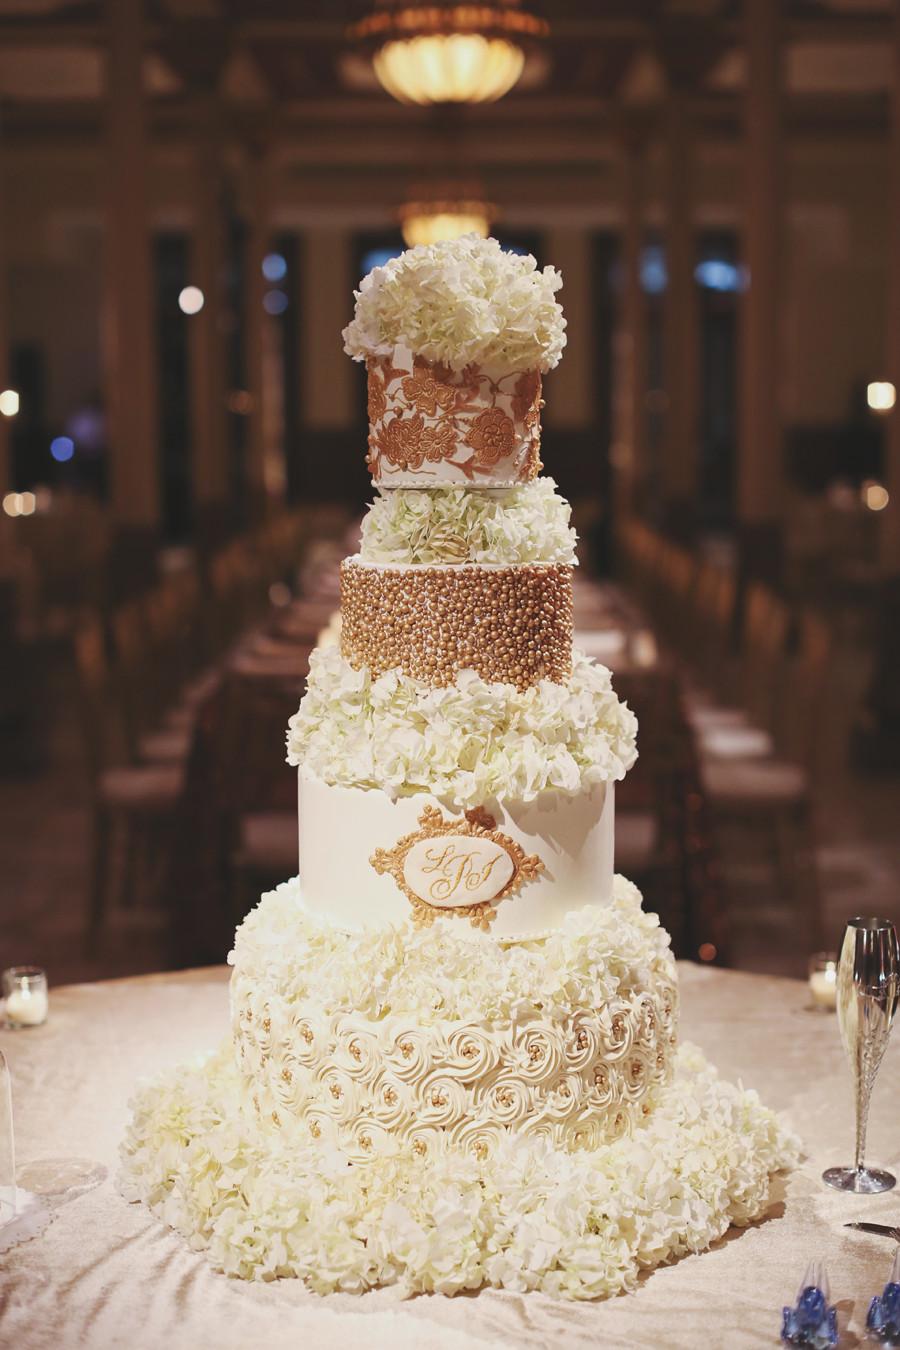 White And Gold Wedding Cakes  Elegant Gold and White Wedding Cake Elizabeth Anne